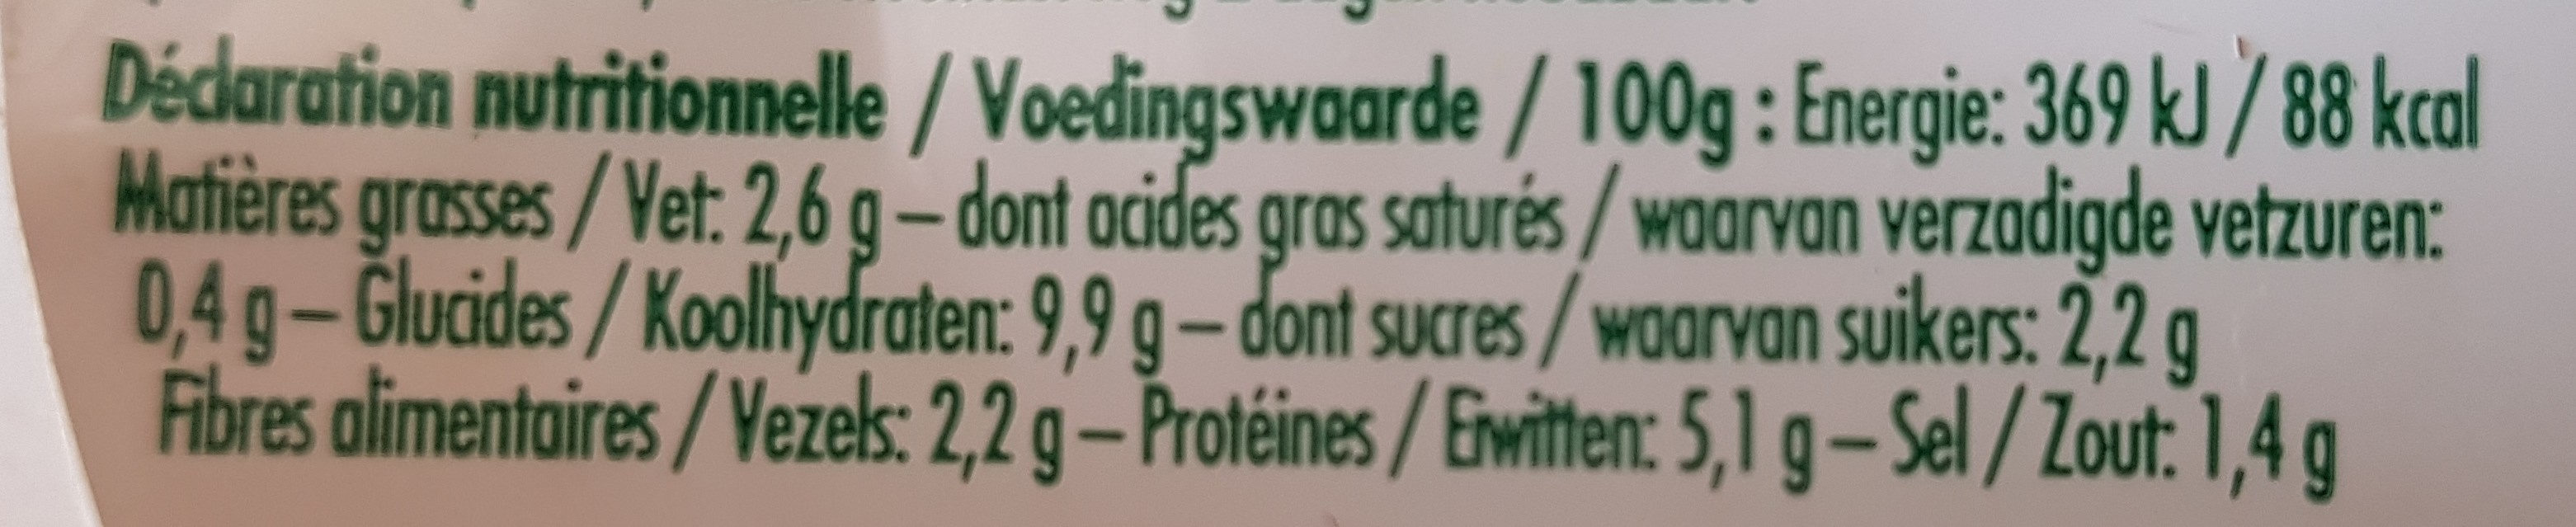 Salade Nicoise - Informations nutritionnelles